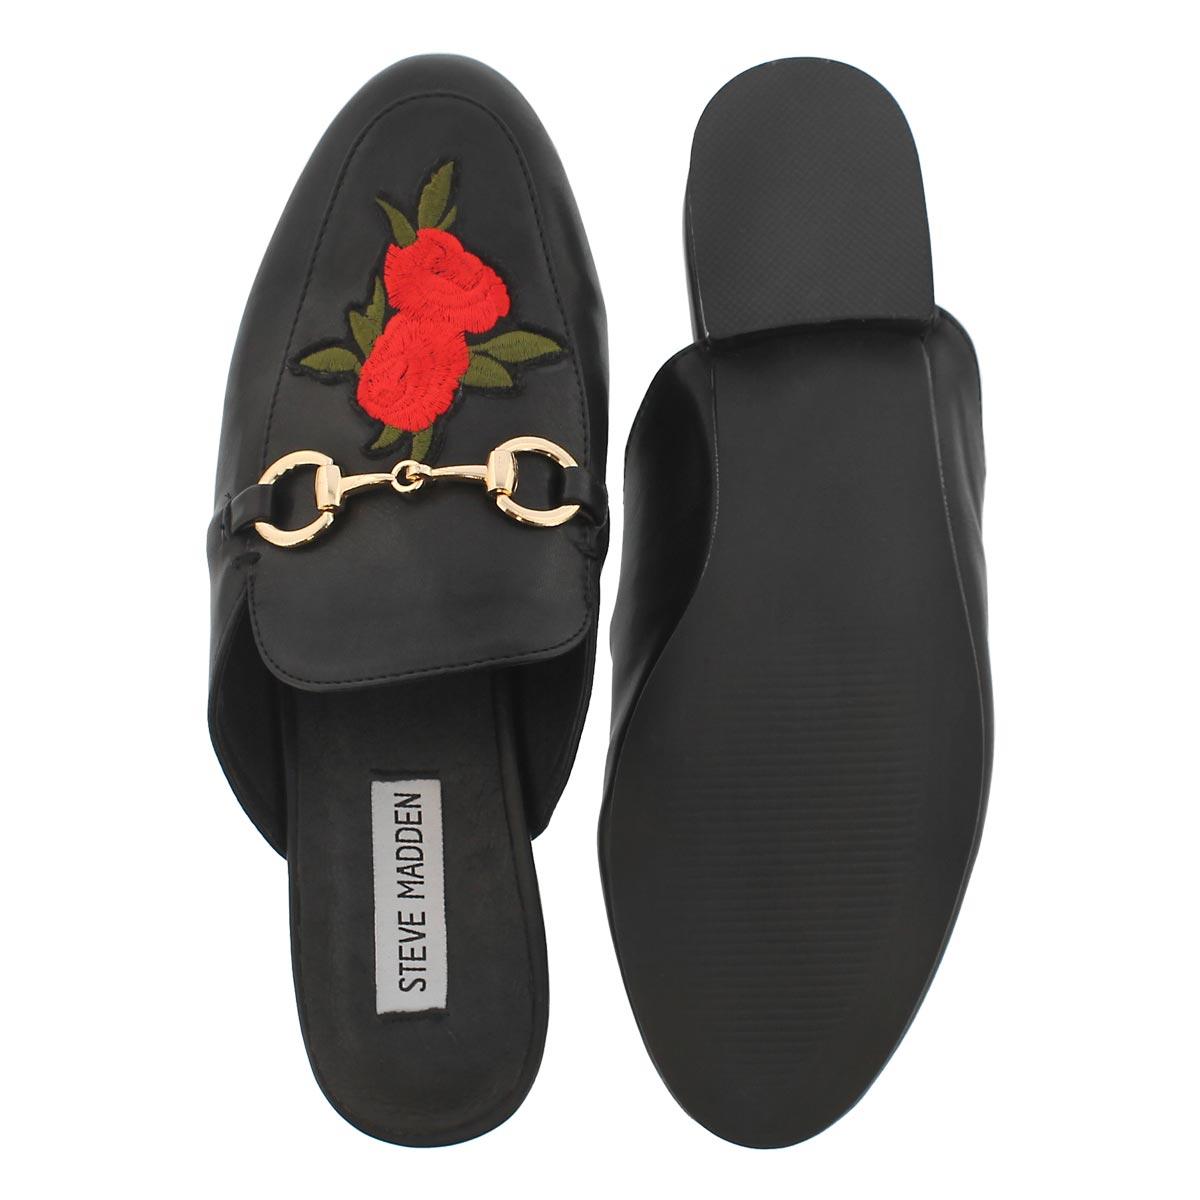 Lds Devyn black slip on dress loafer